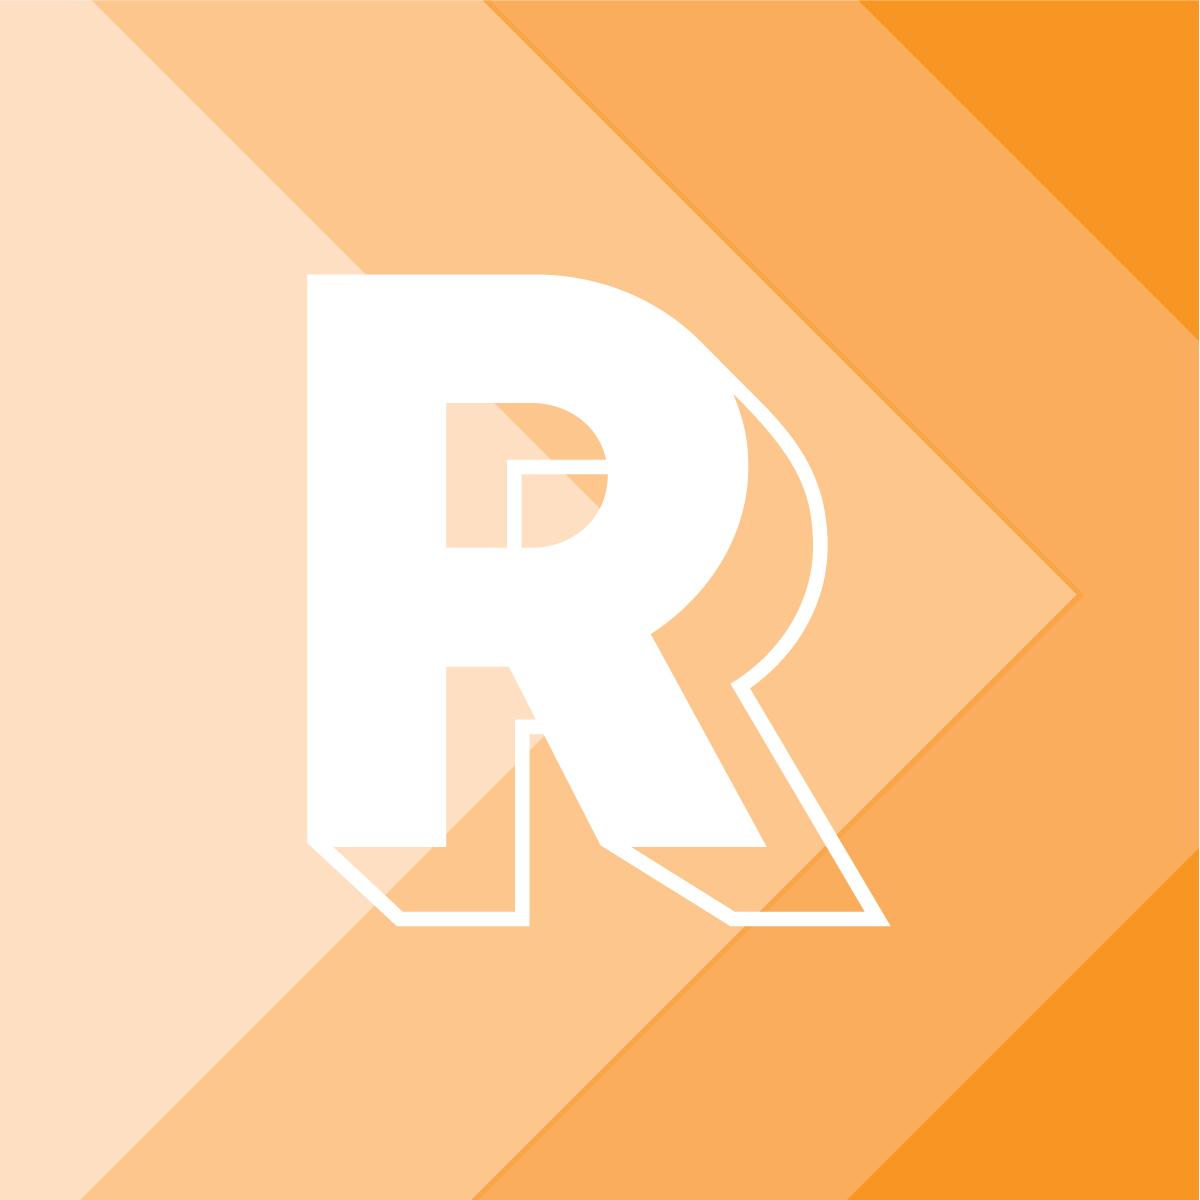 RADIATE small logo